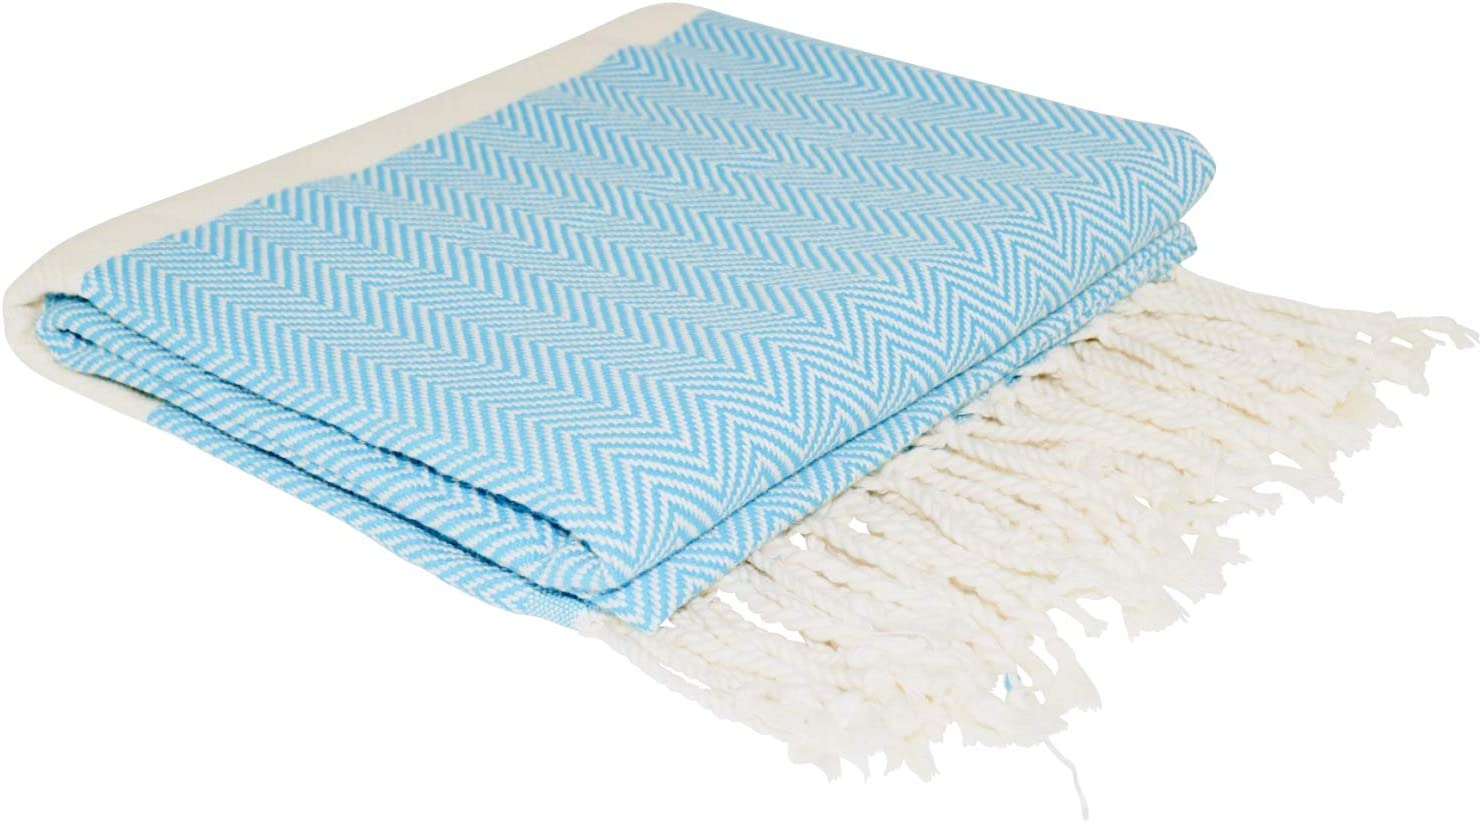 SCN Premium Serviette de hammam 100/% Coton Turquoise certifi/é /Öko-Tex 100 100 x 180 cm Beige